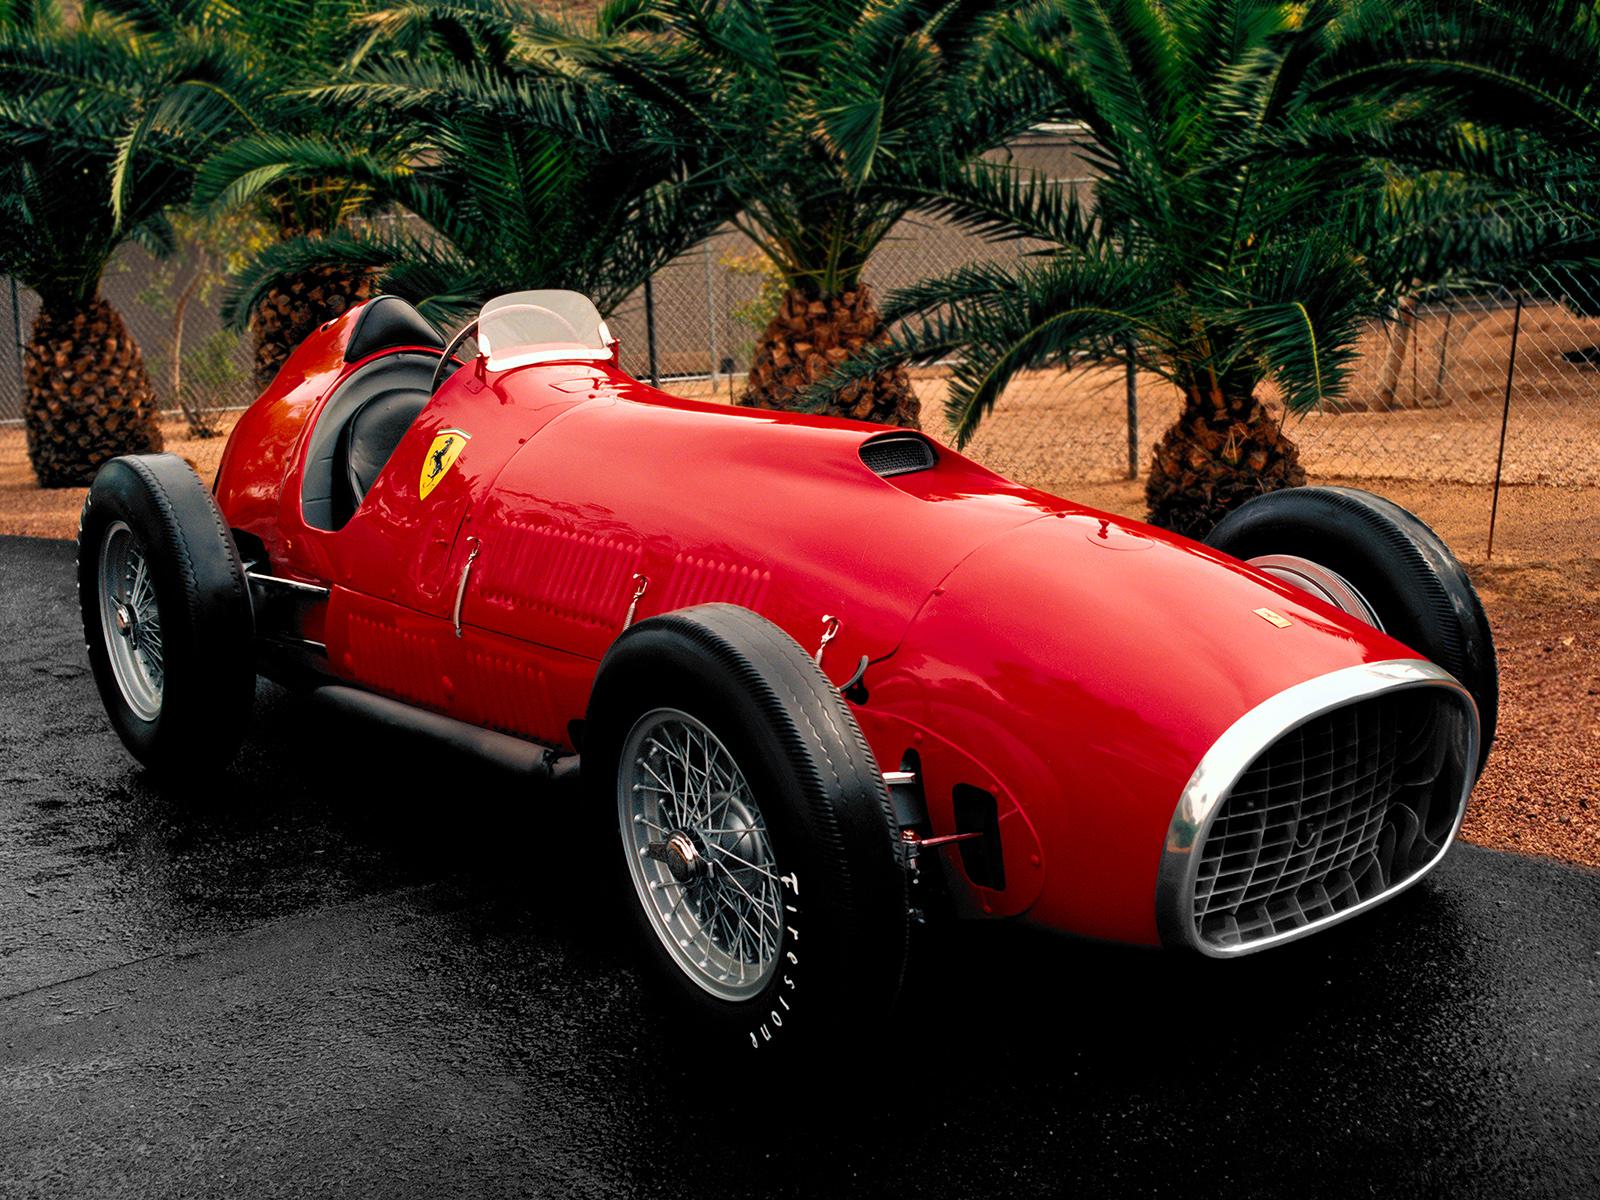 Ferrari 375 F1 1952 Wallpaper And Background Image